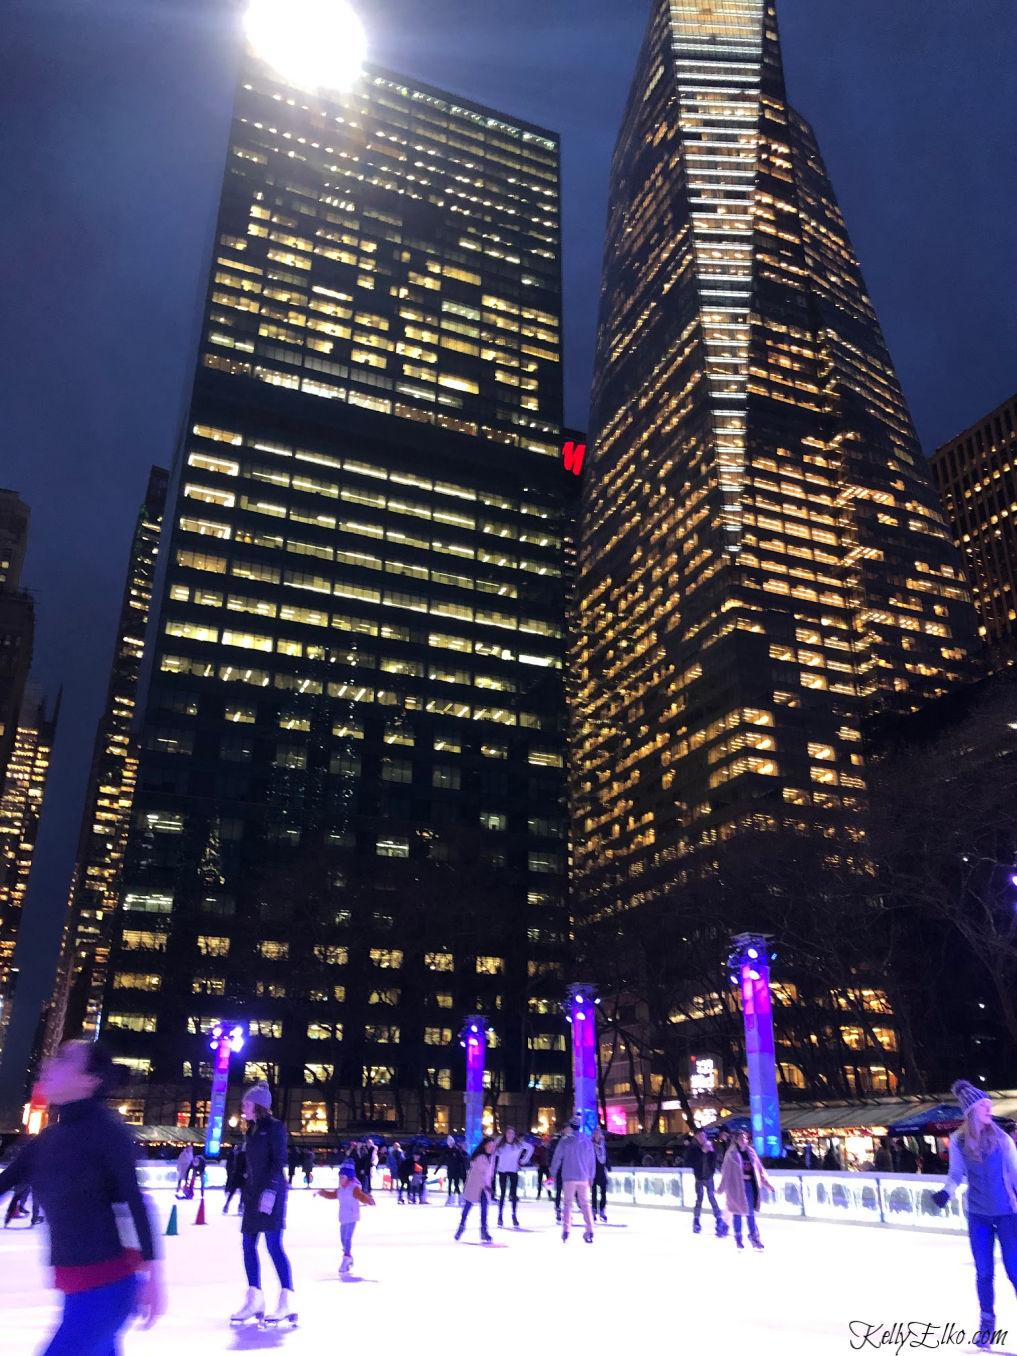 Bryant Park ice rink kellyelko.com #newyork #ny #bryantpark #iceskating #icerink #travelblog #travelblogger